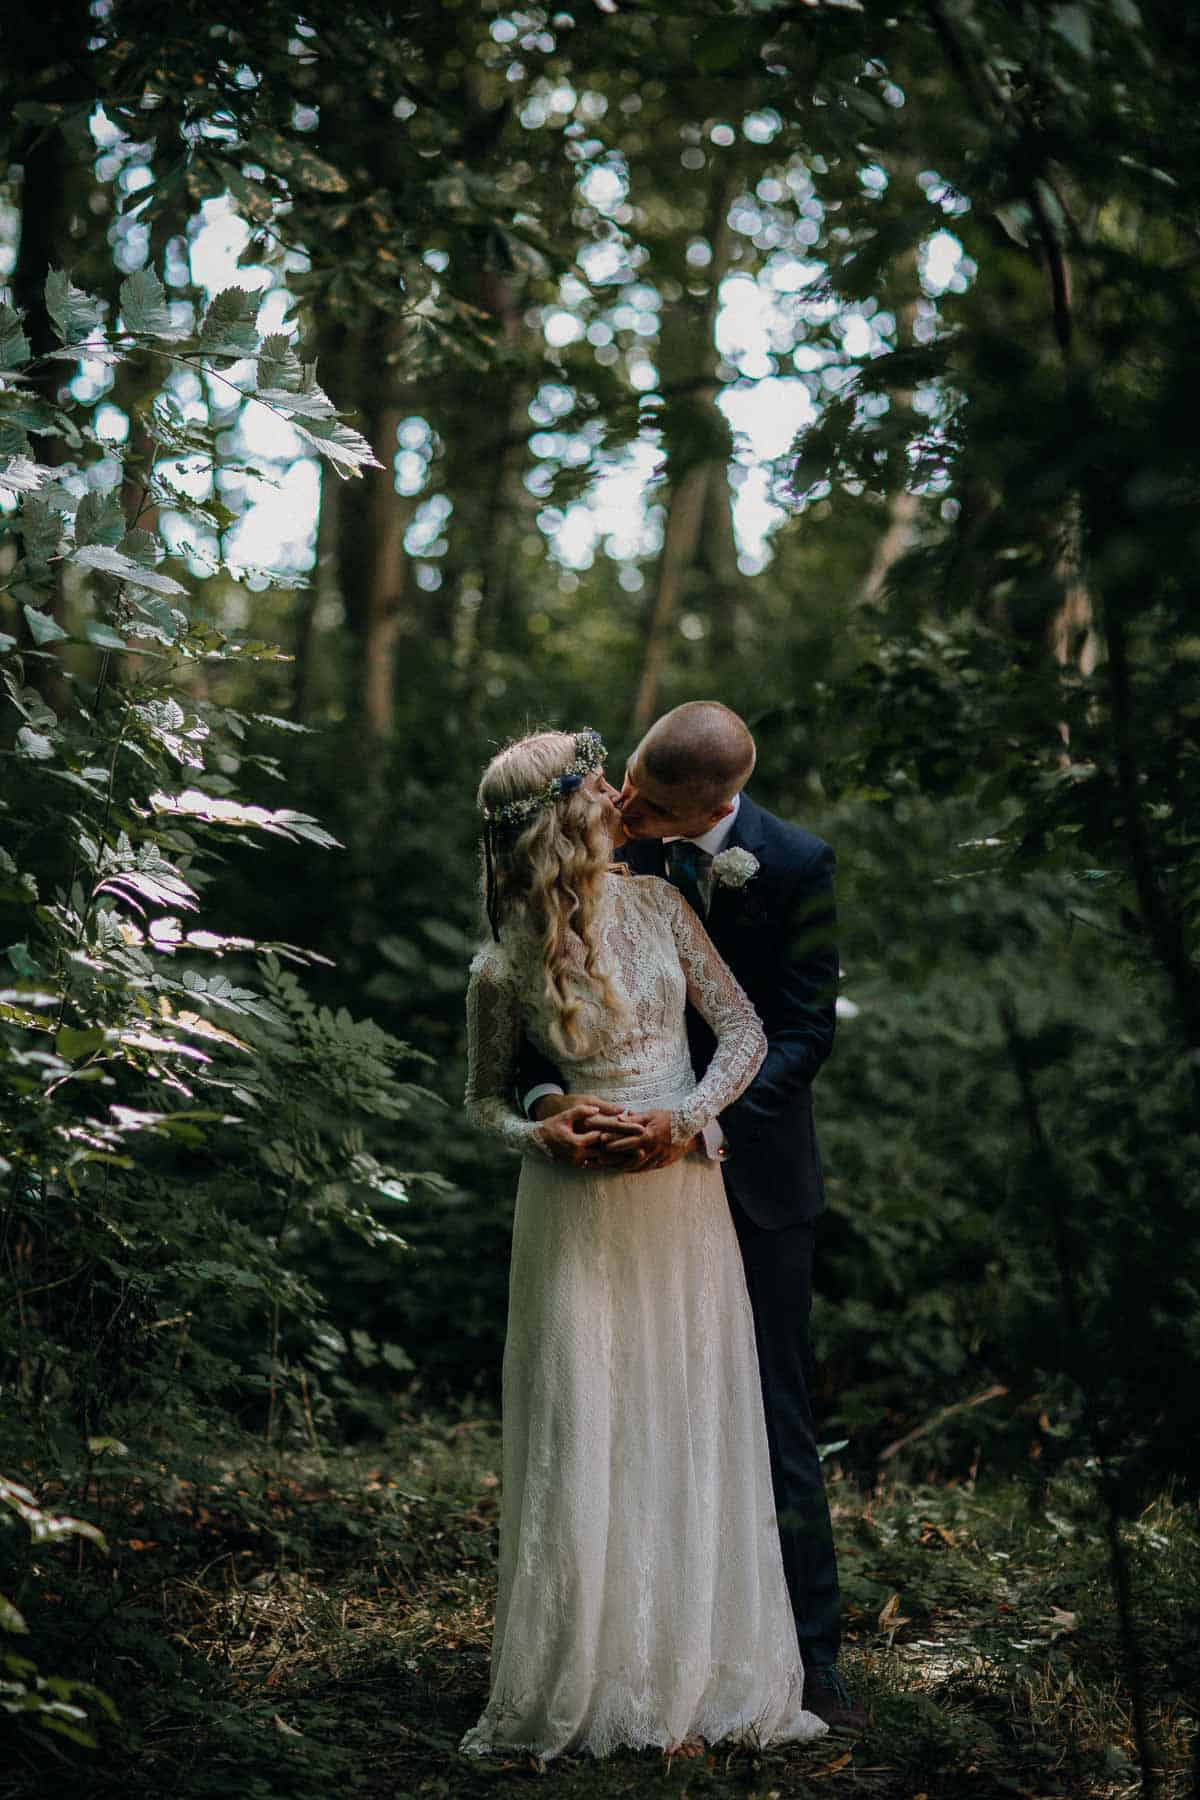 Bryllup | Unikke bryllupslokaler i Danmark